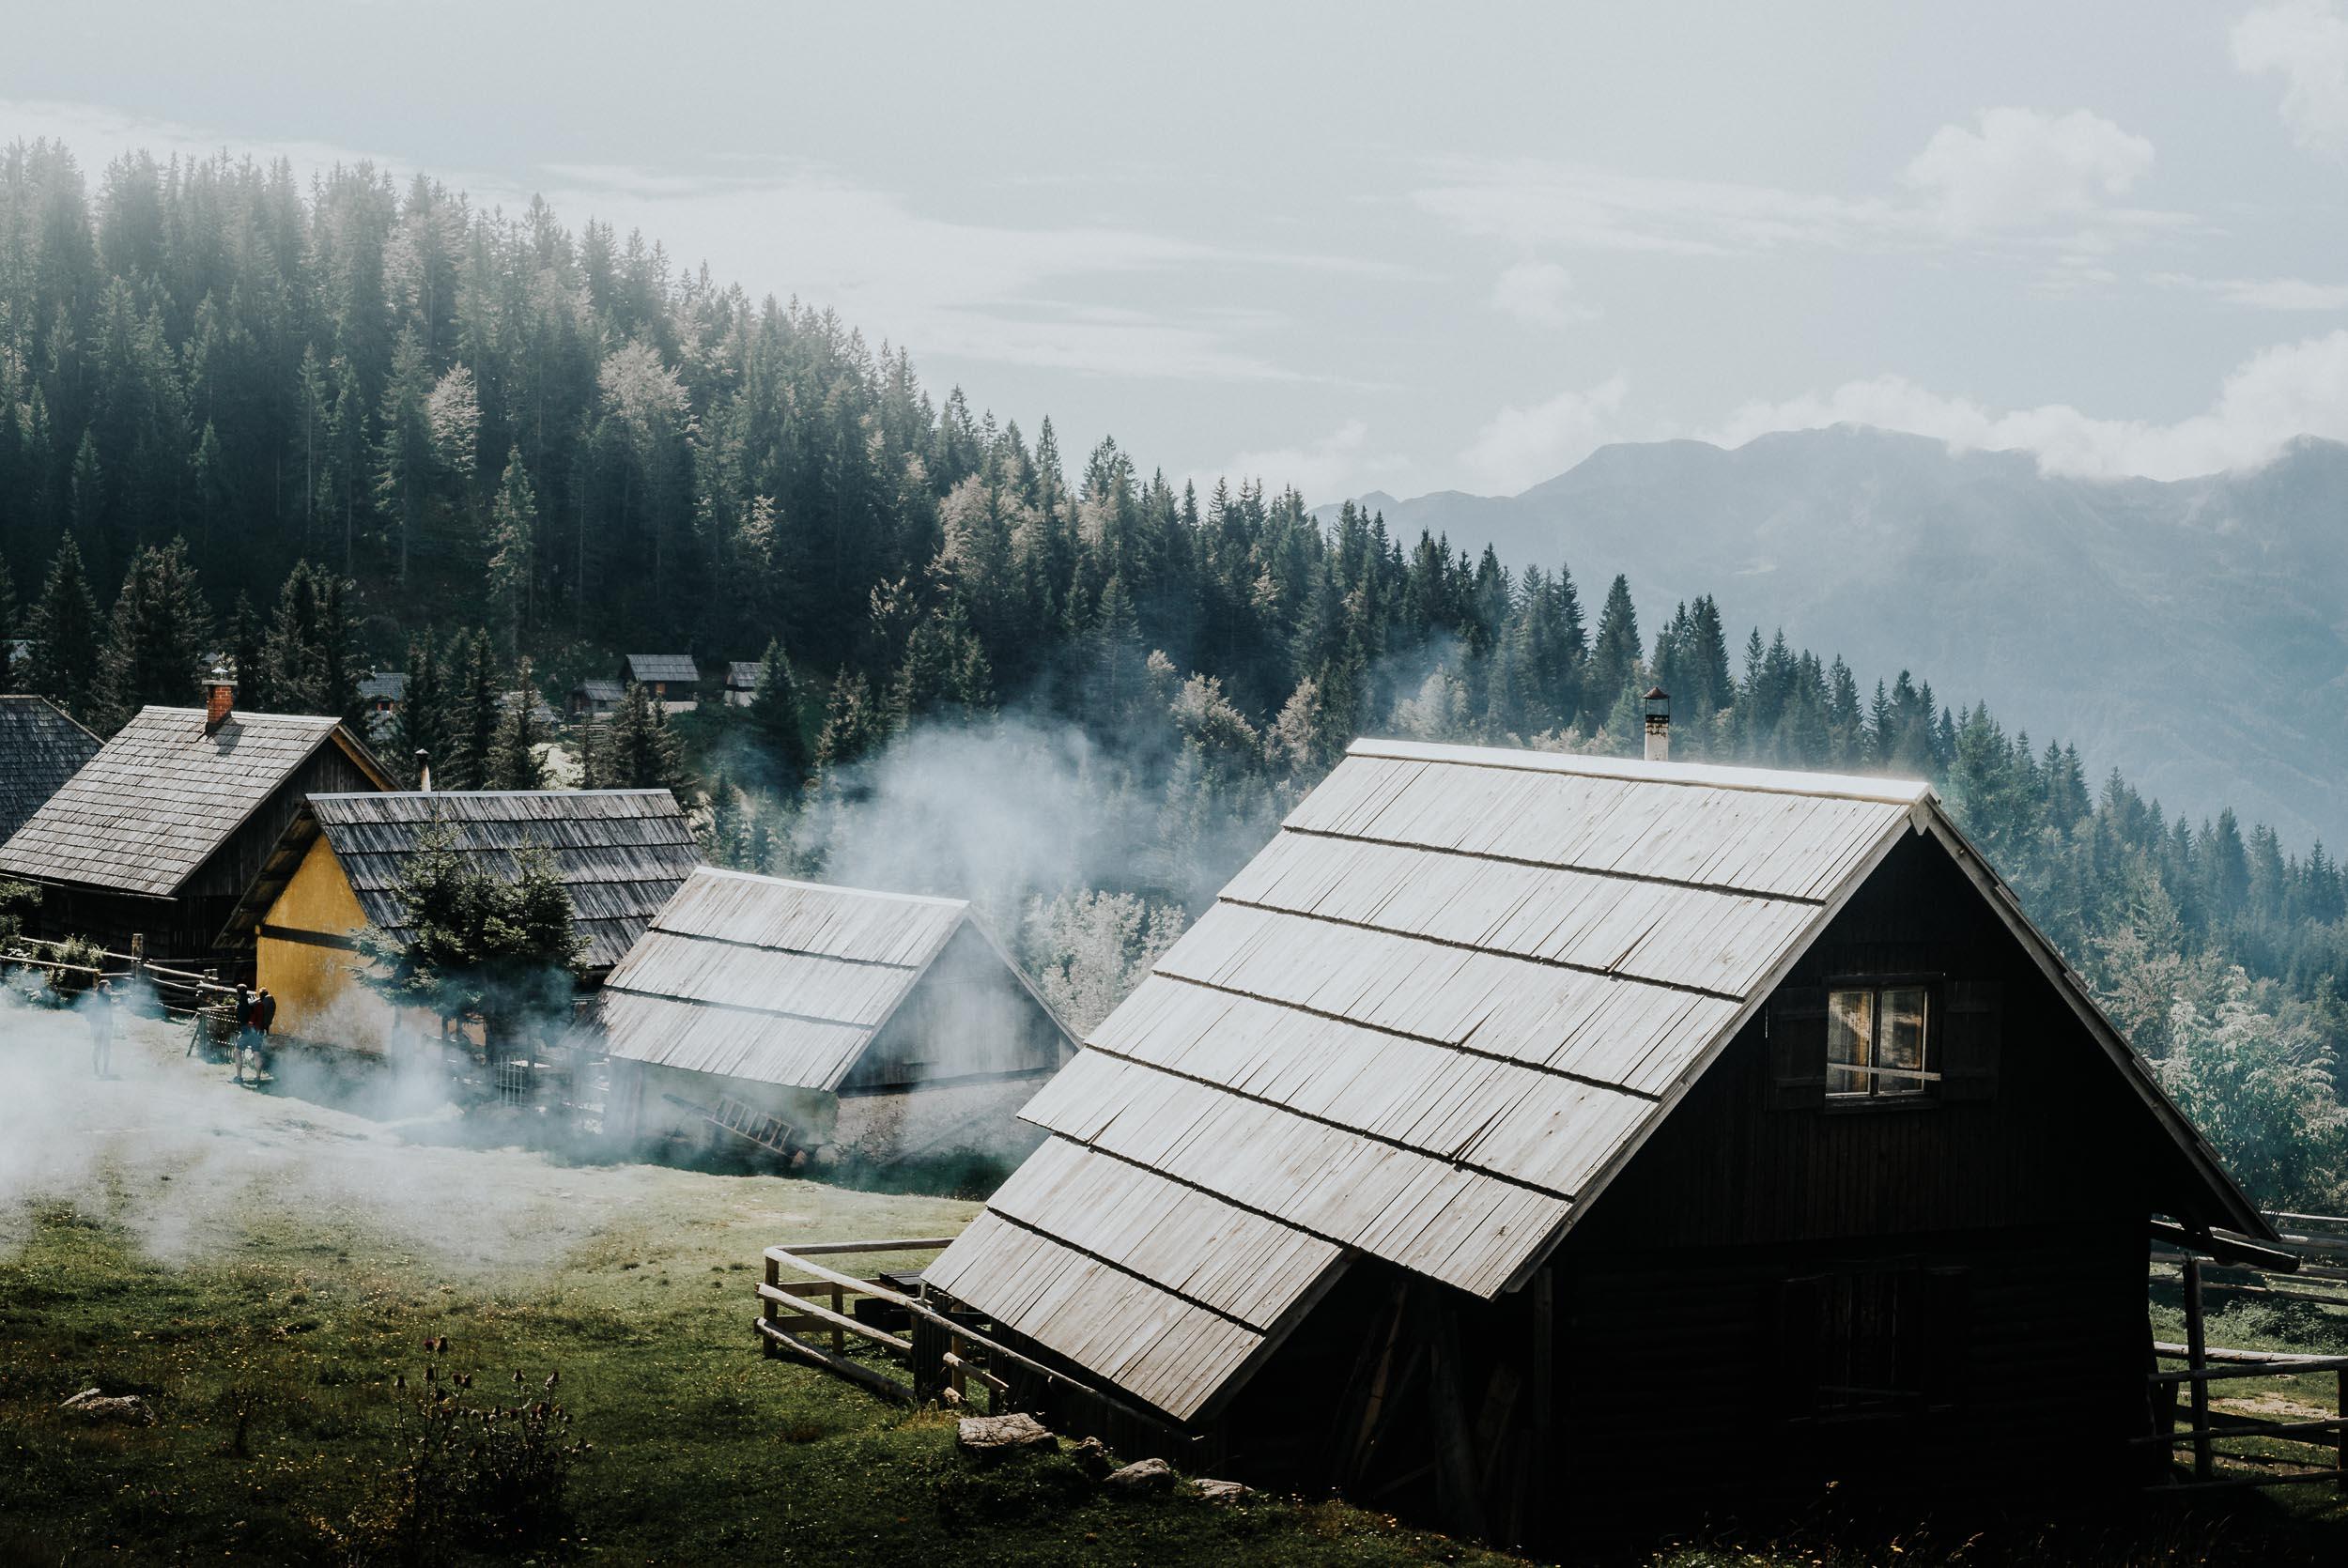 Drifting Smoke Across the Planina